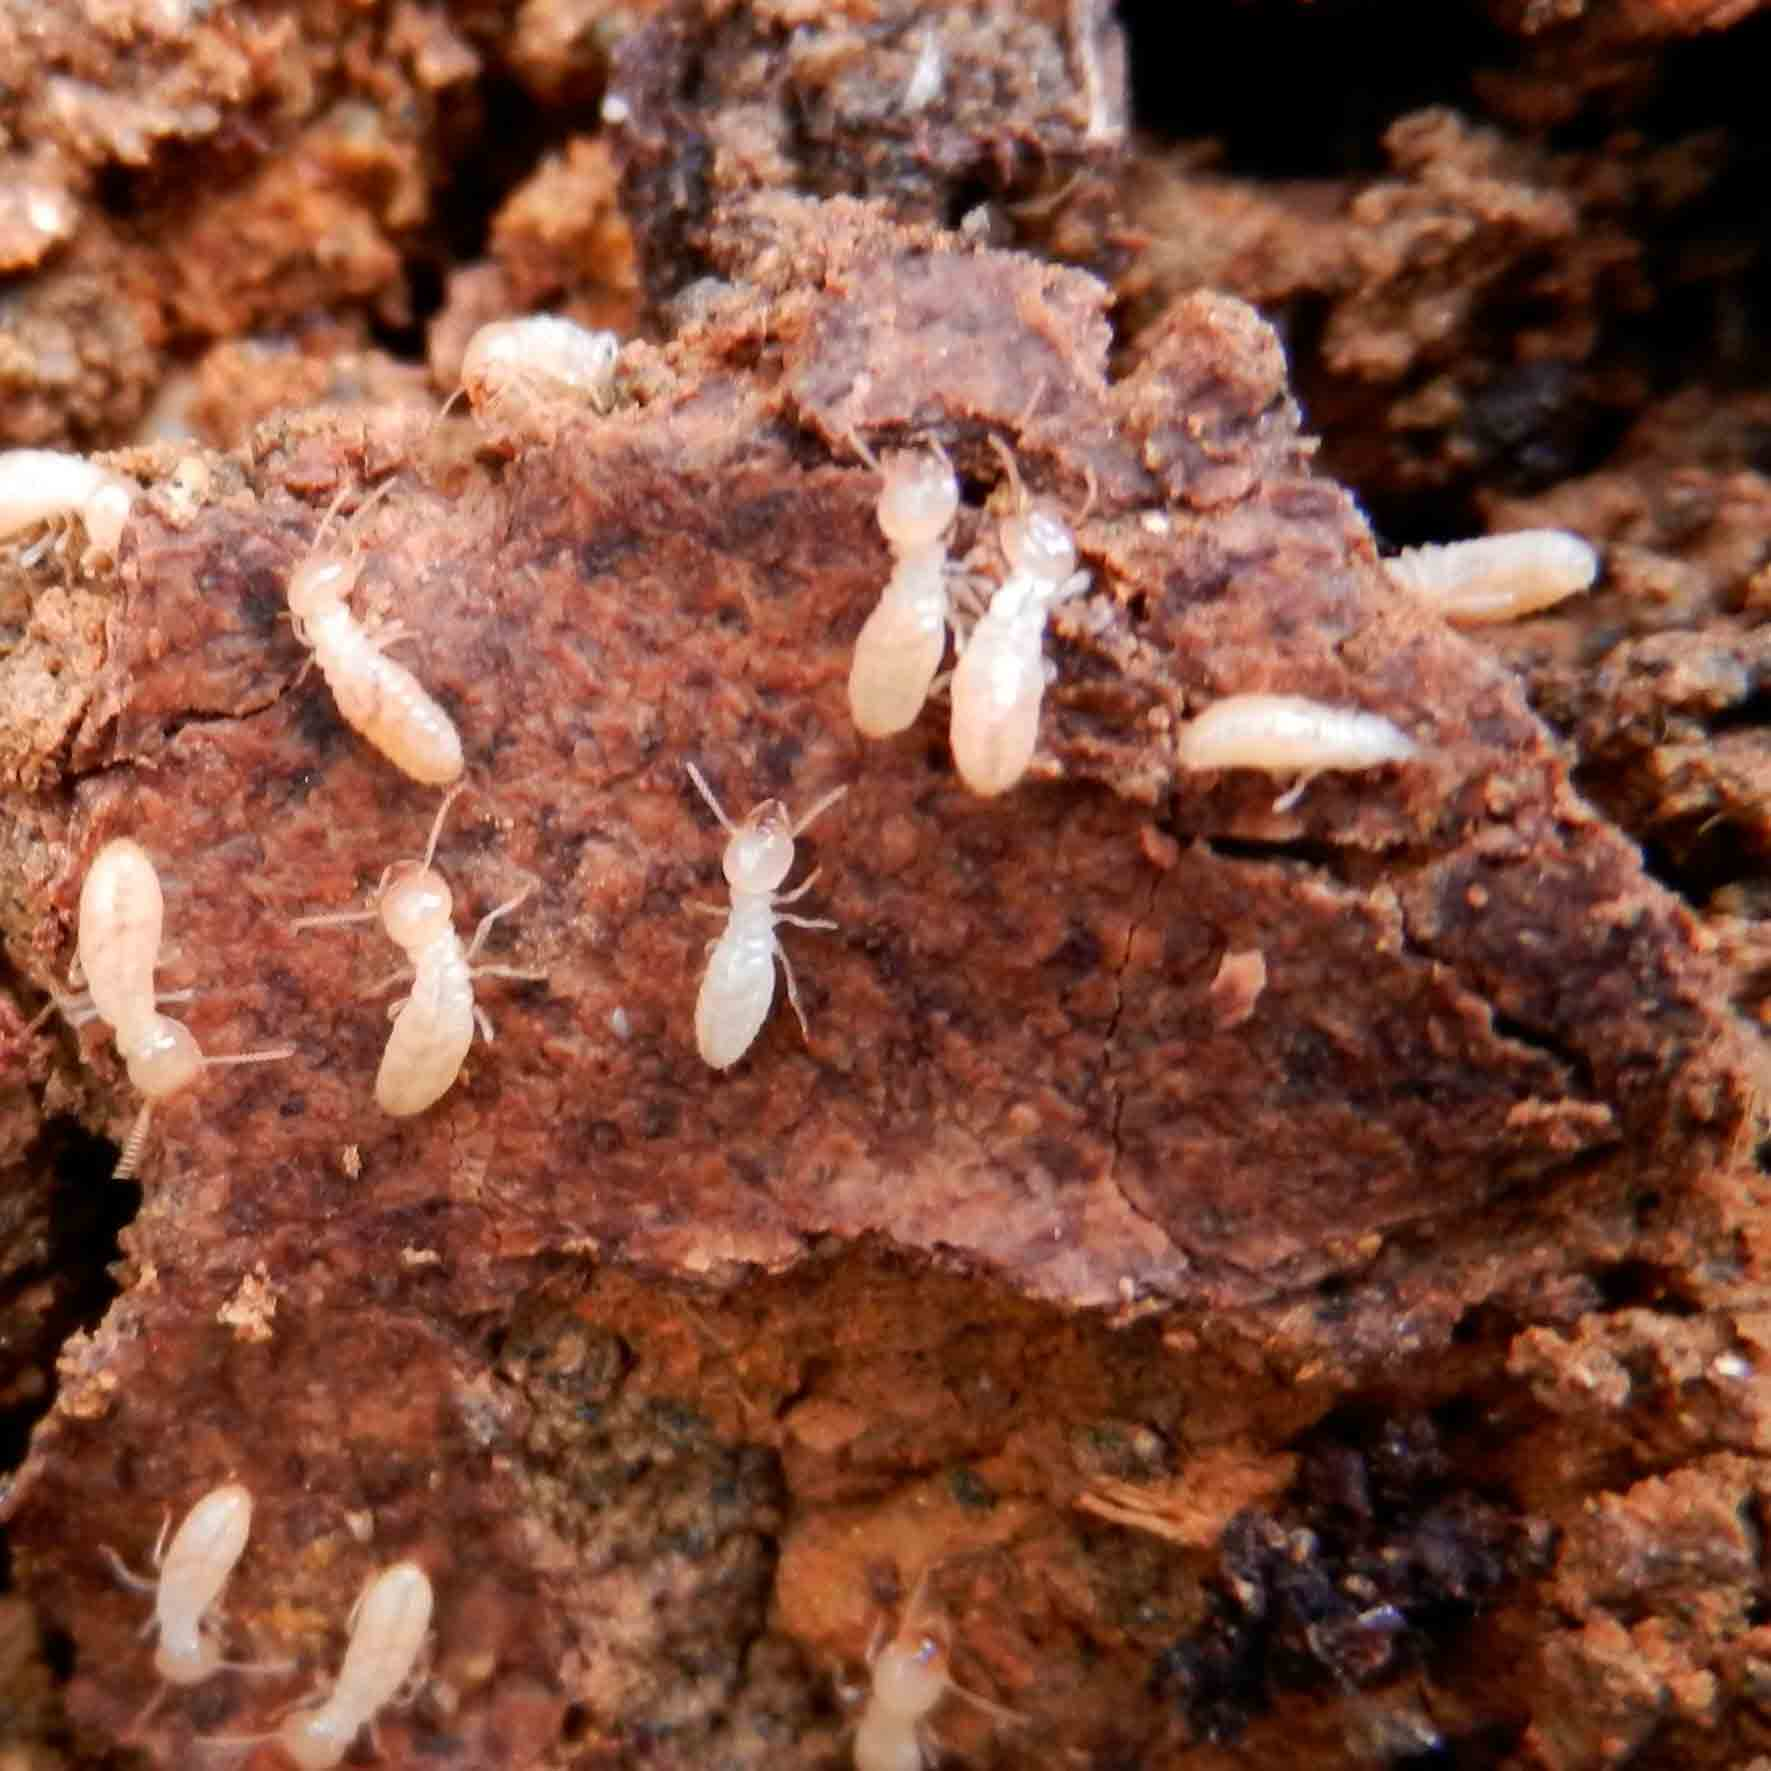 Adult Termites